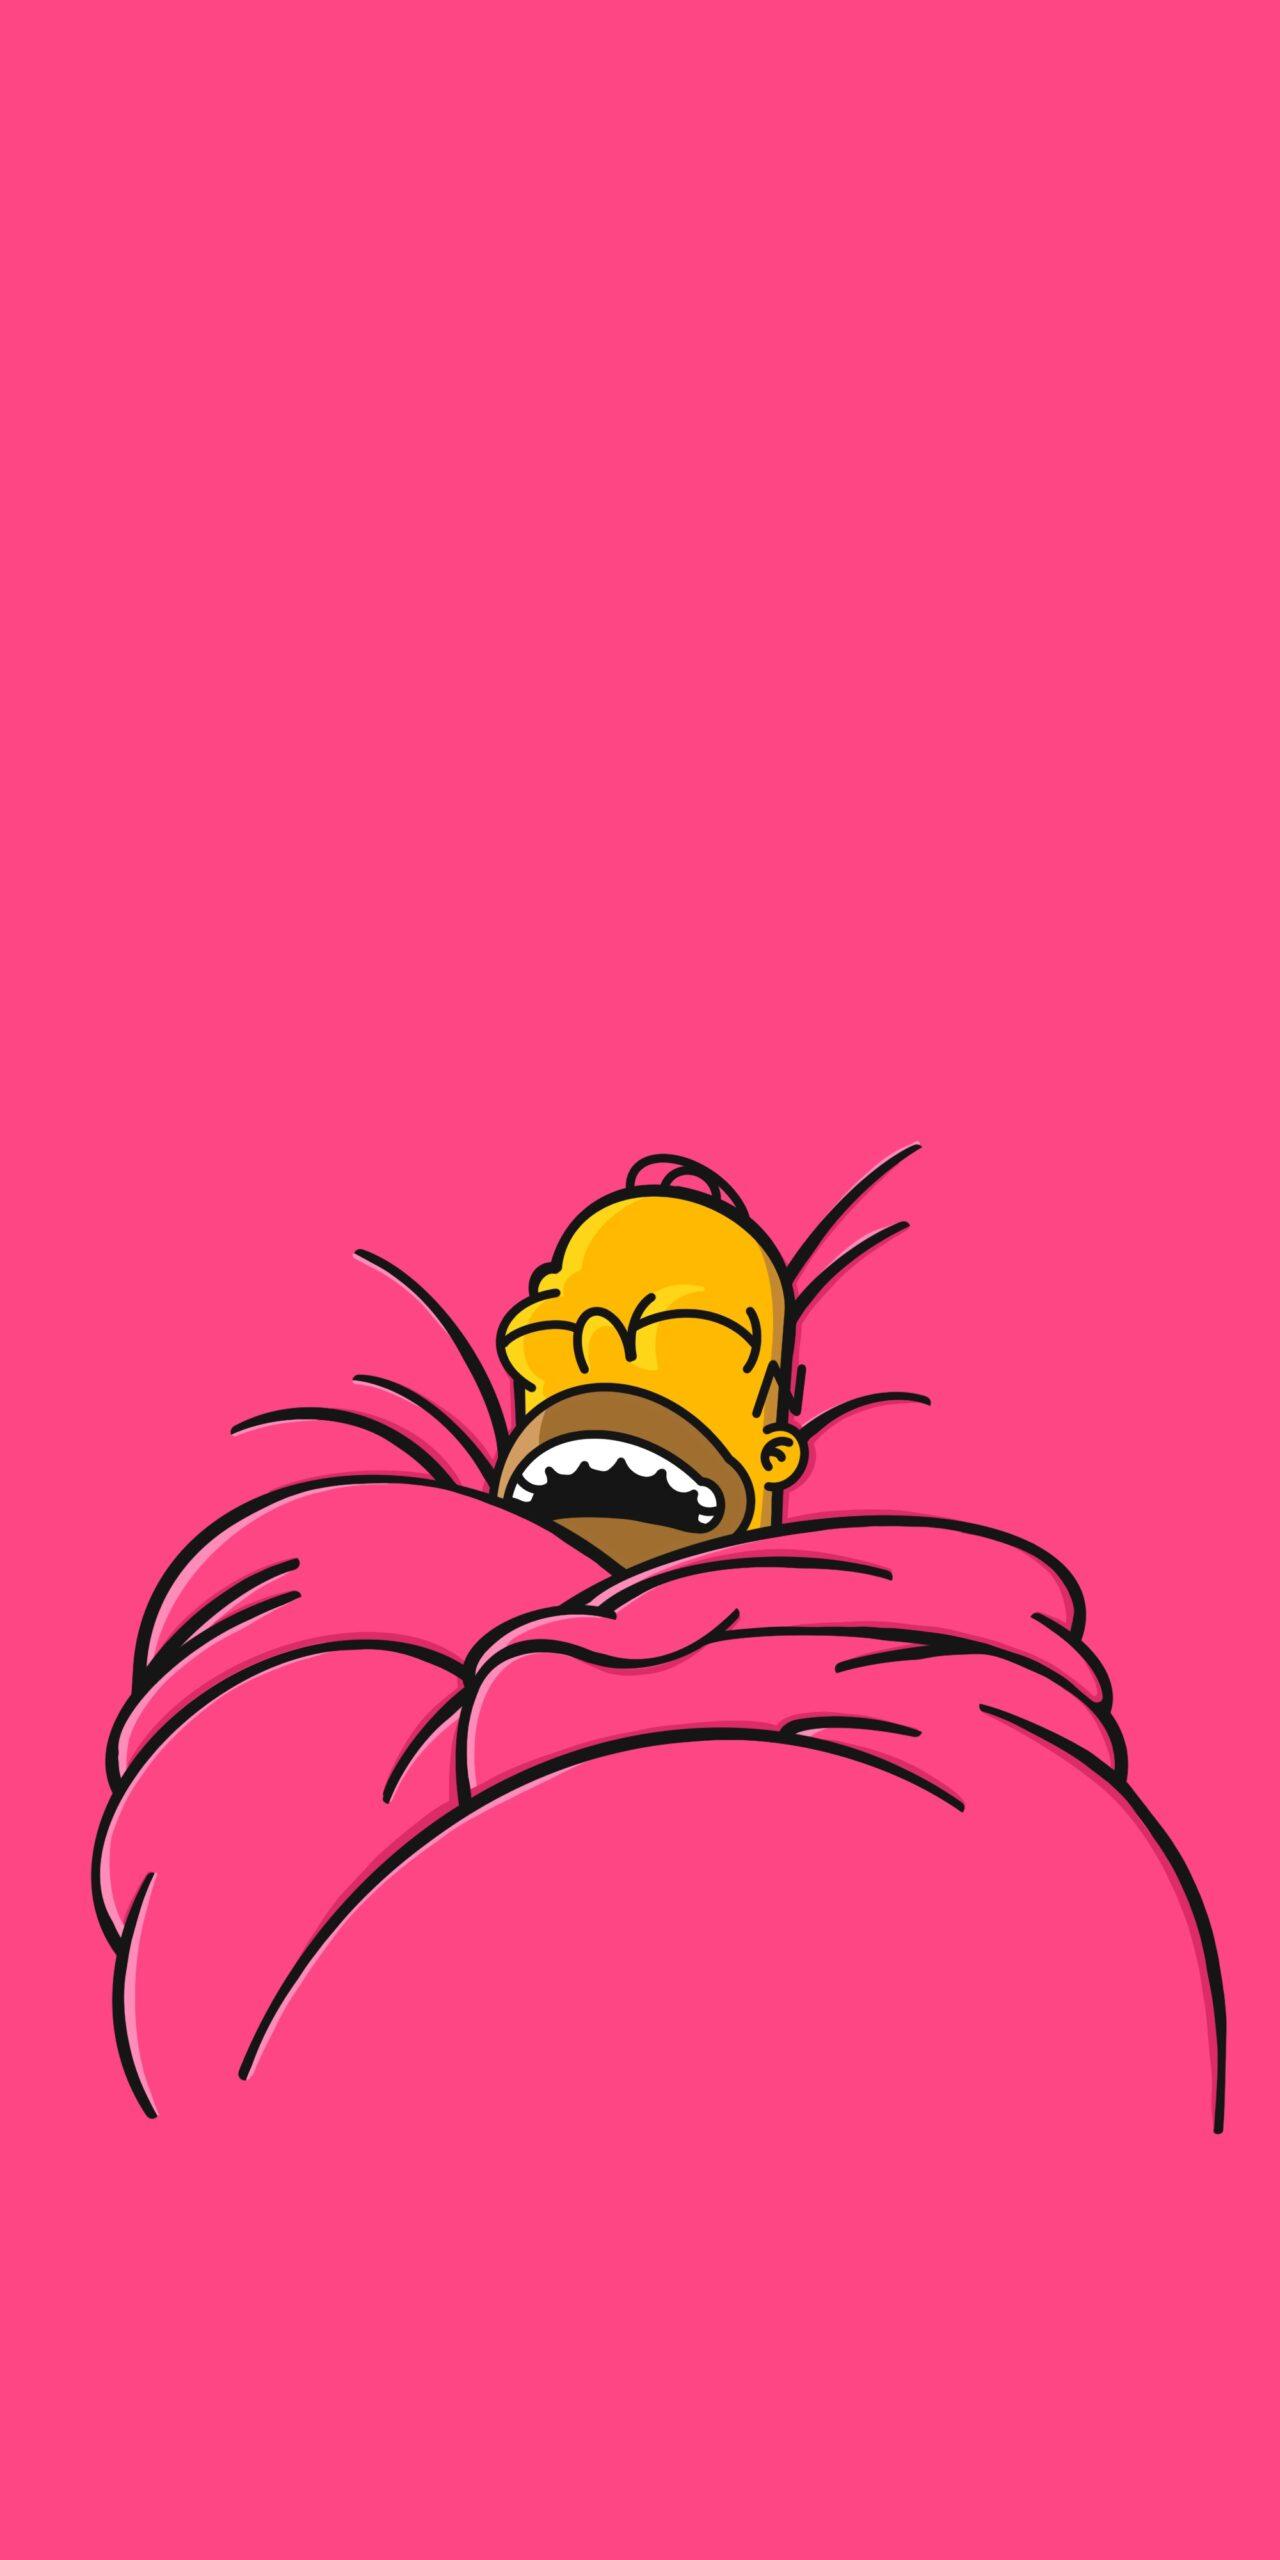 homer simpson sleeping pink wallpaper